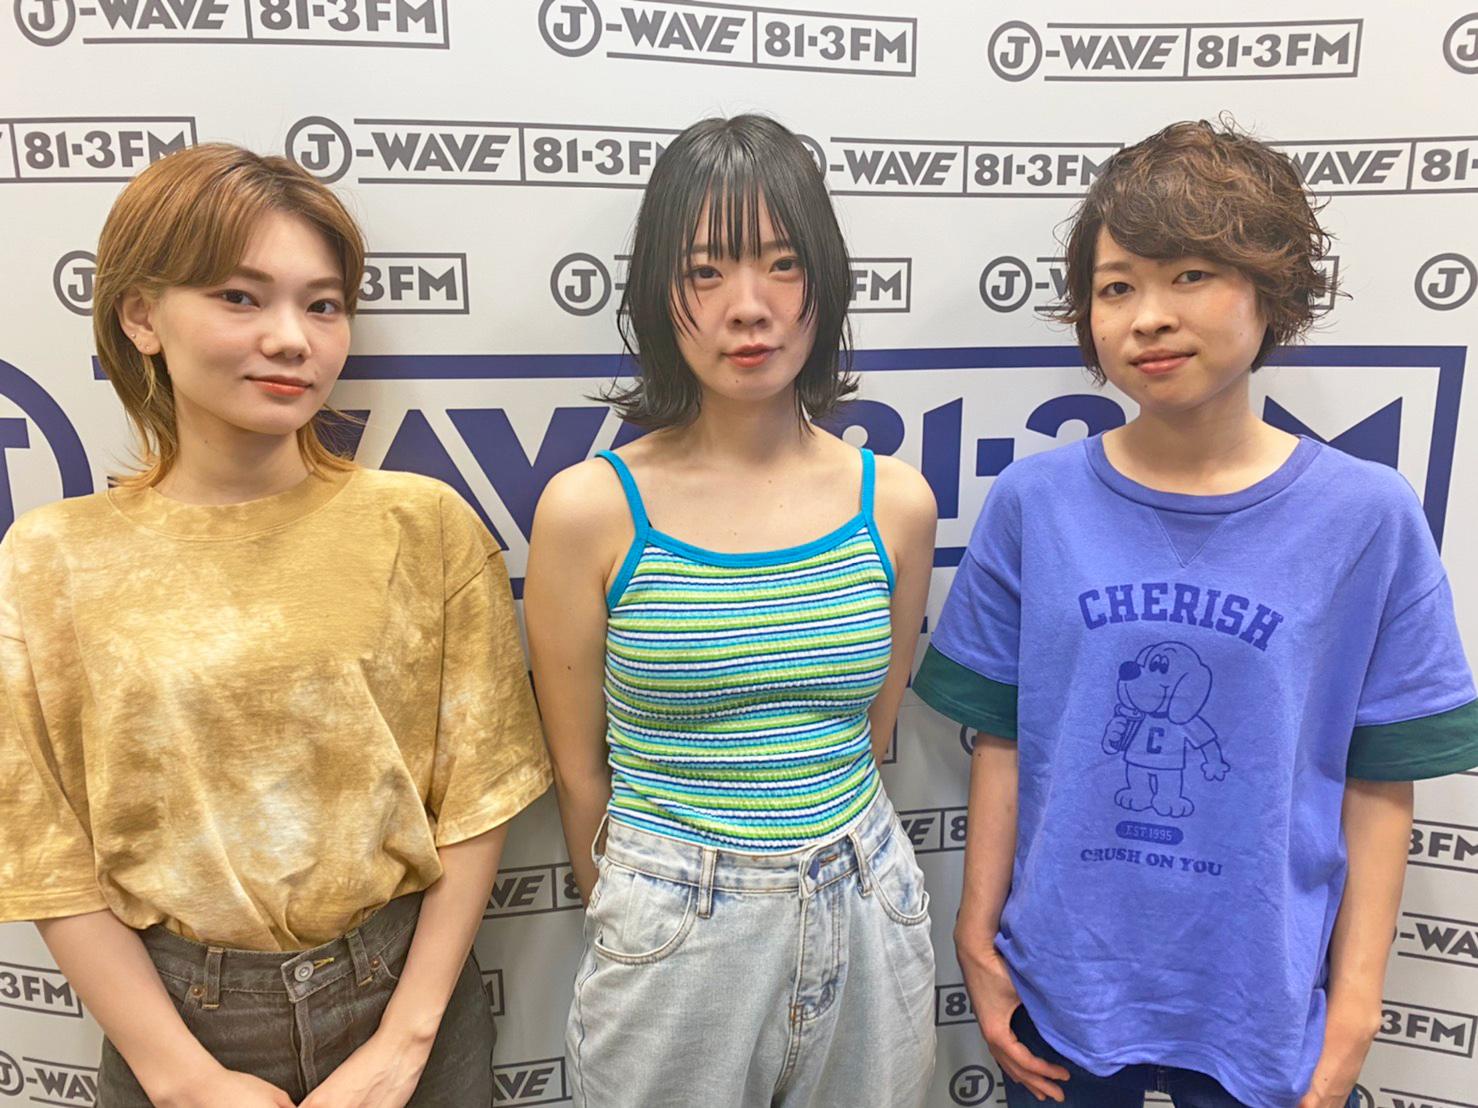 https://www.j-wave.co.jp/blog/spark/images/0817_SHISHAMO.jpg